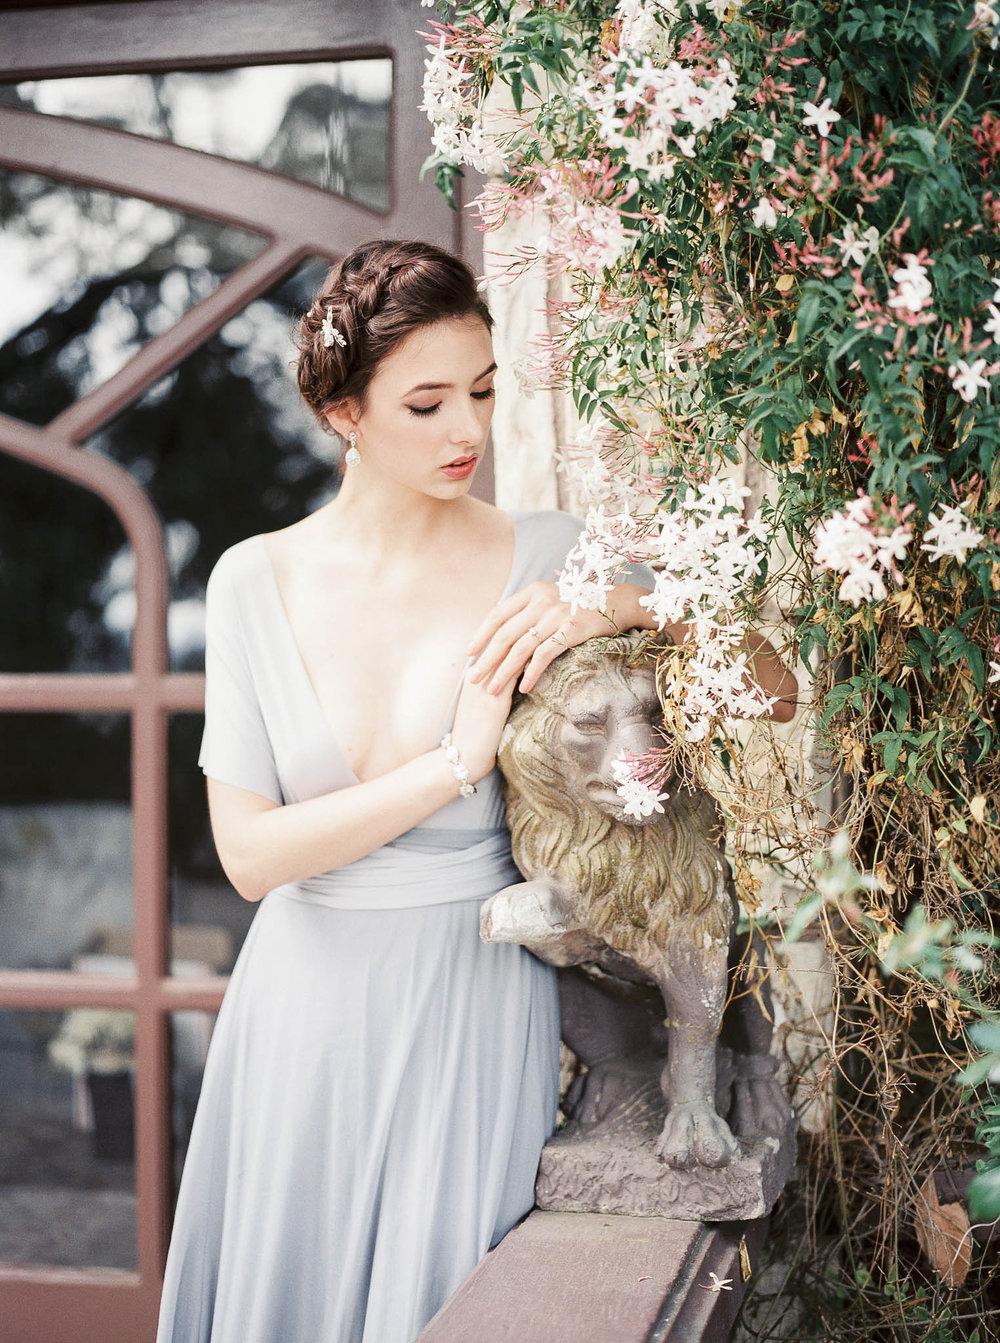 old-world-castle-wedding-inspiration-bridal-lara-lam-16.jpg